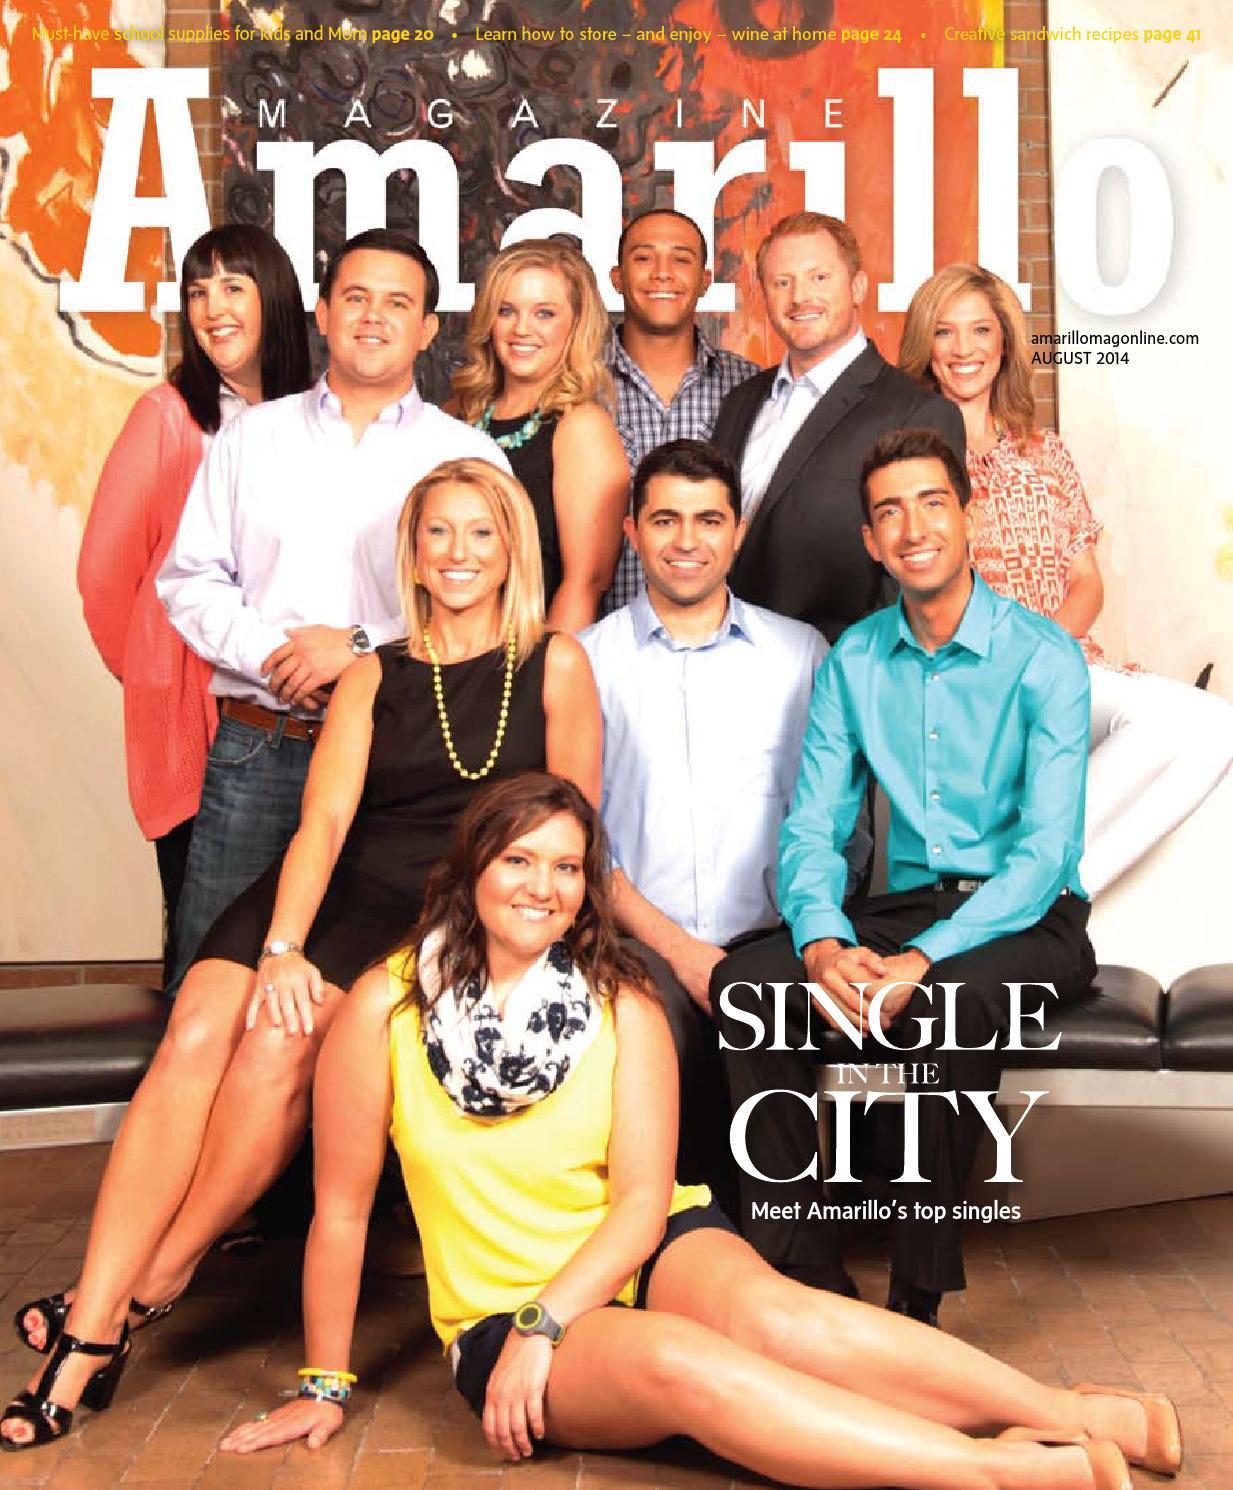 Amarillo singles